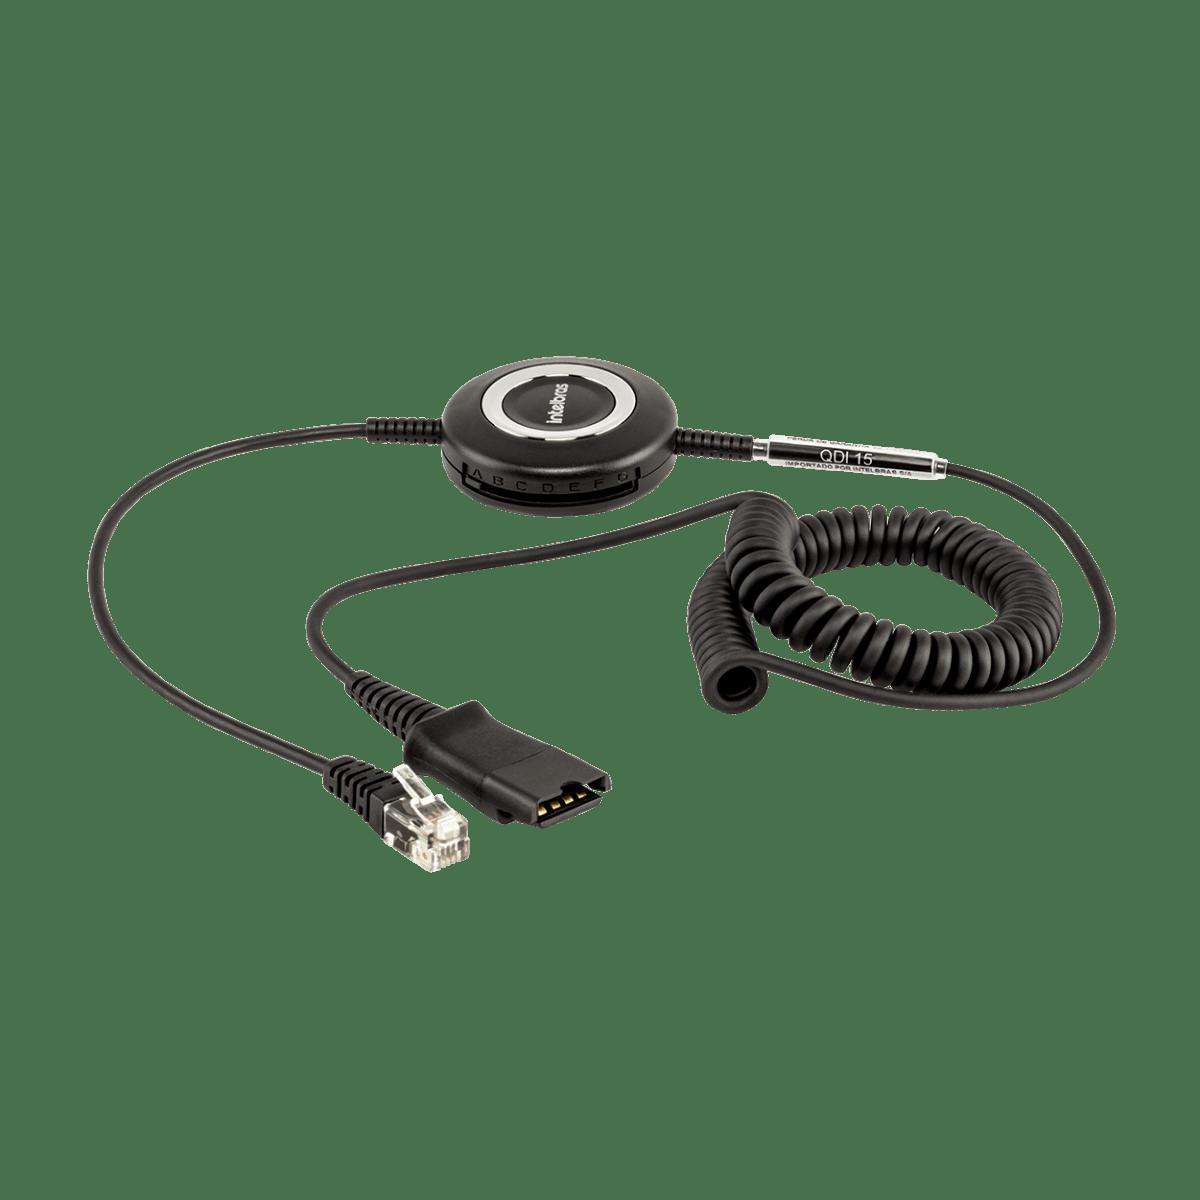 Cordão para Headset Intelbras QD-RJ9 QDI 15